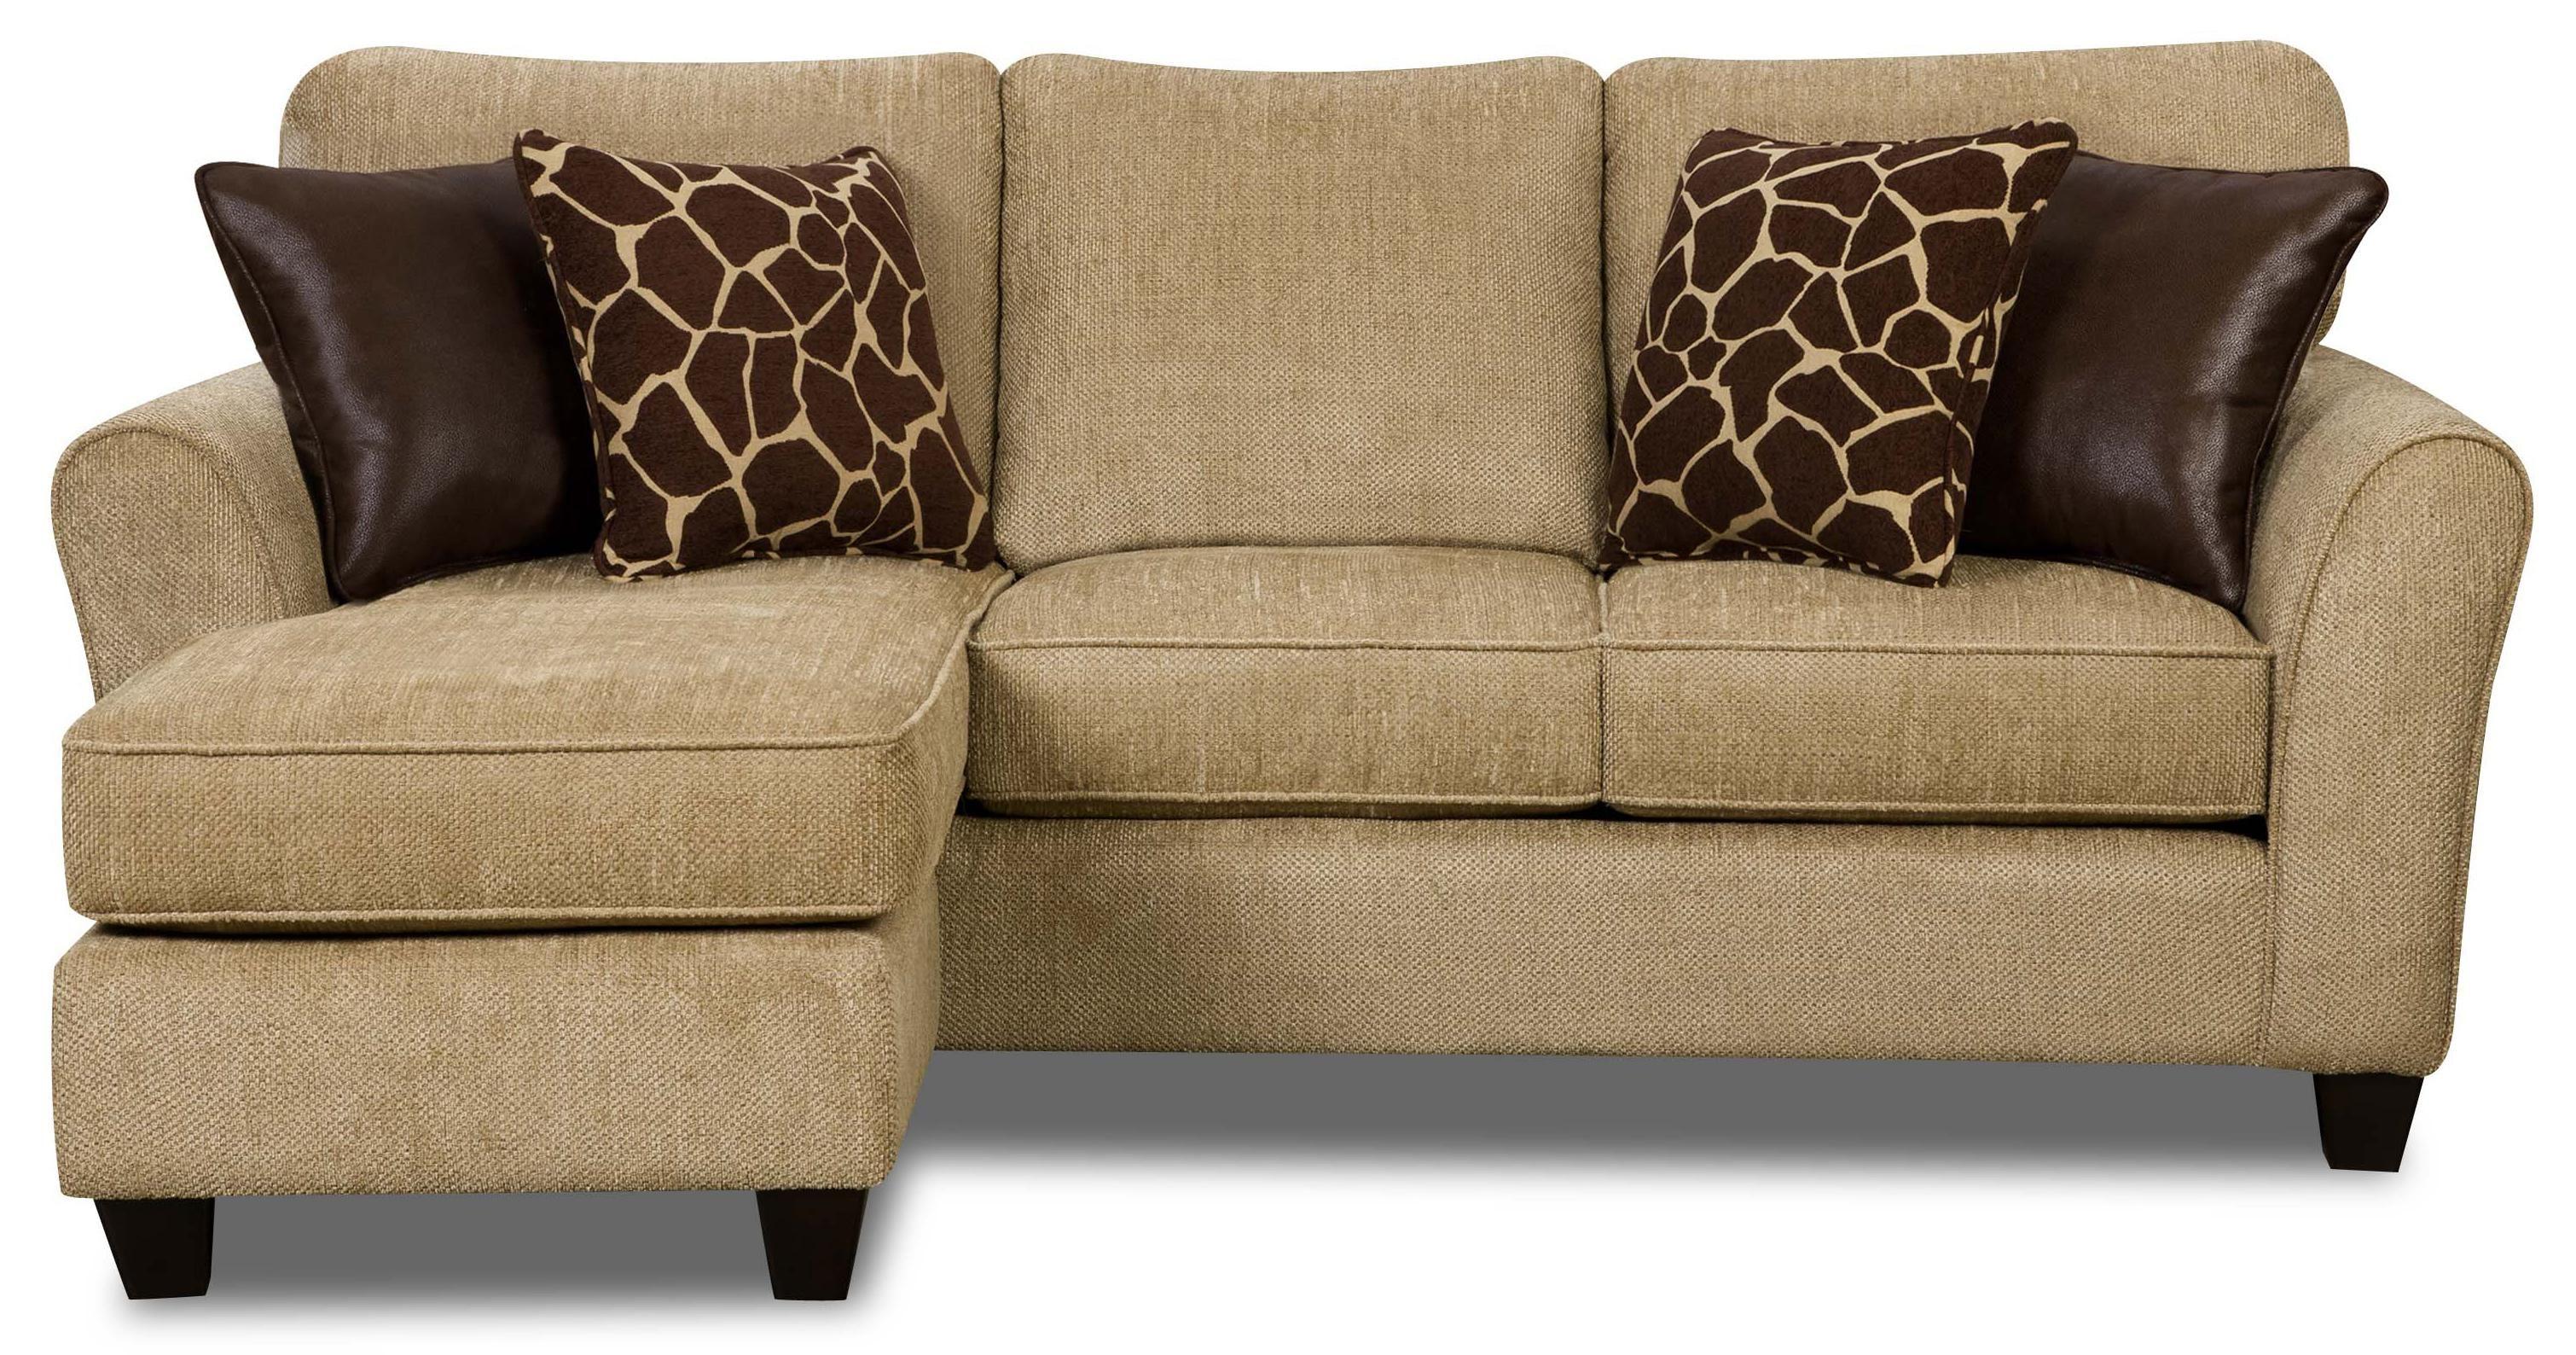 4808 Chofa Sofa Chaise by Fusion Furniture